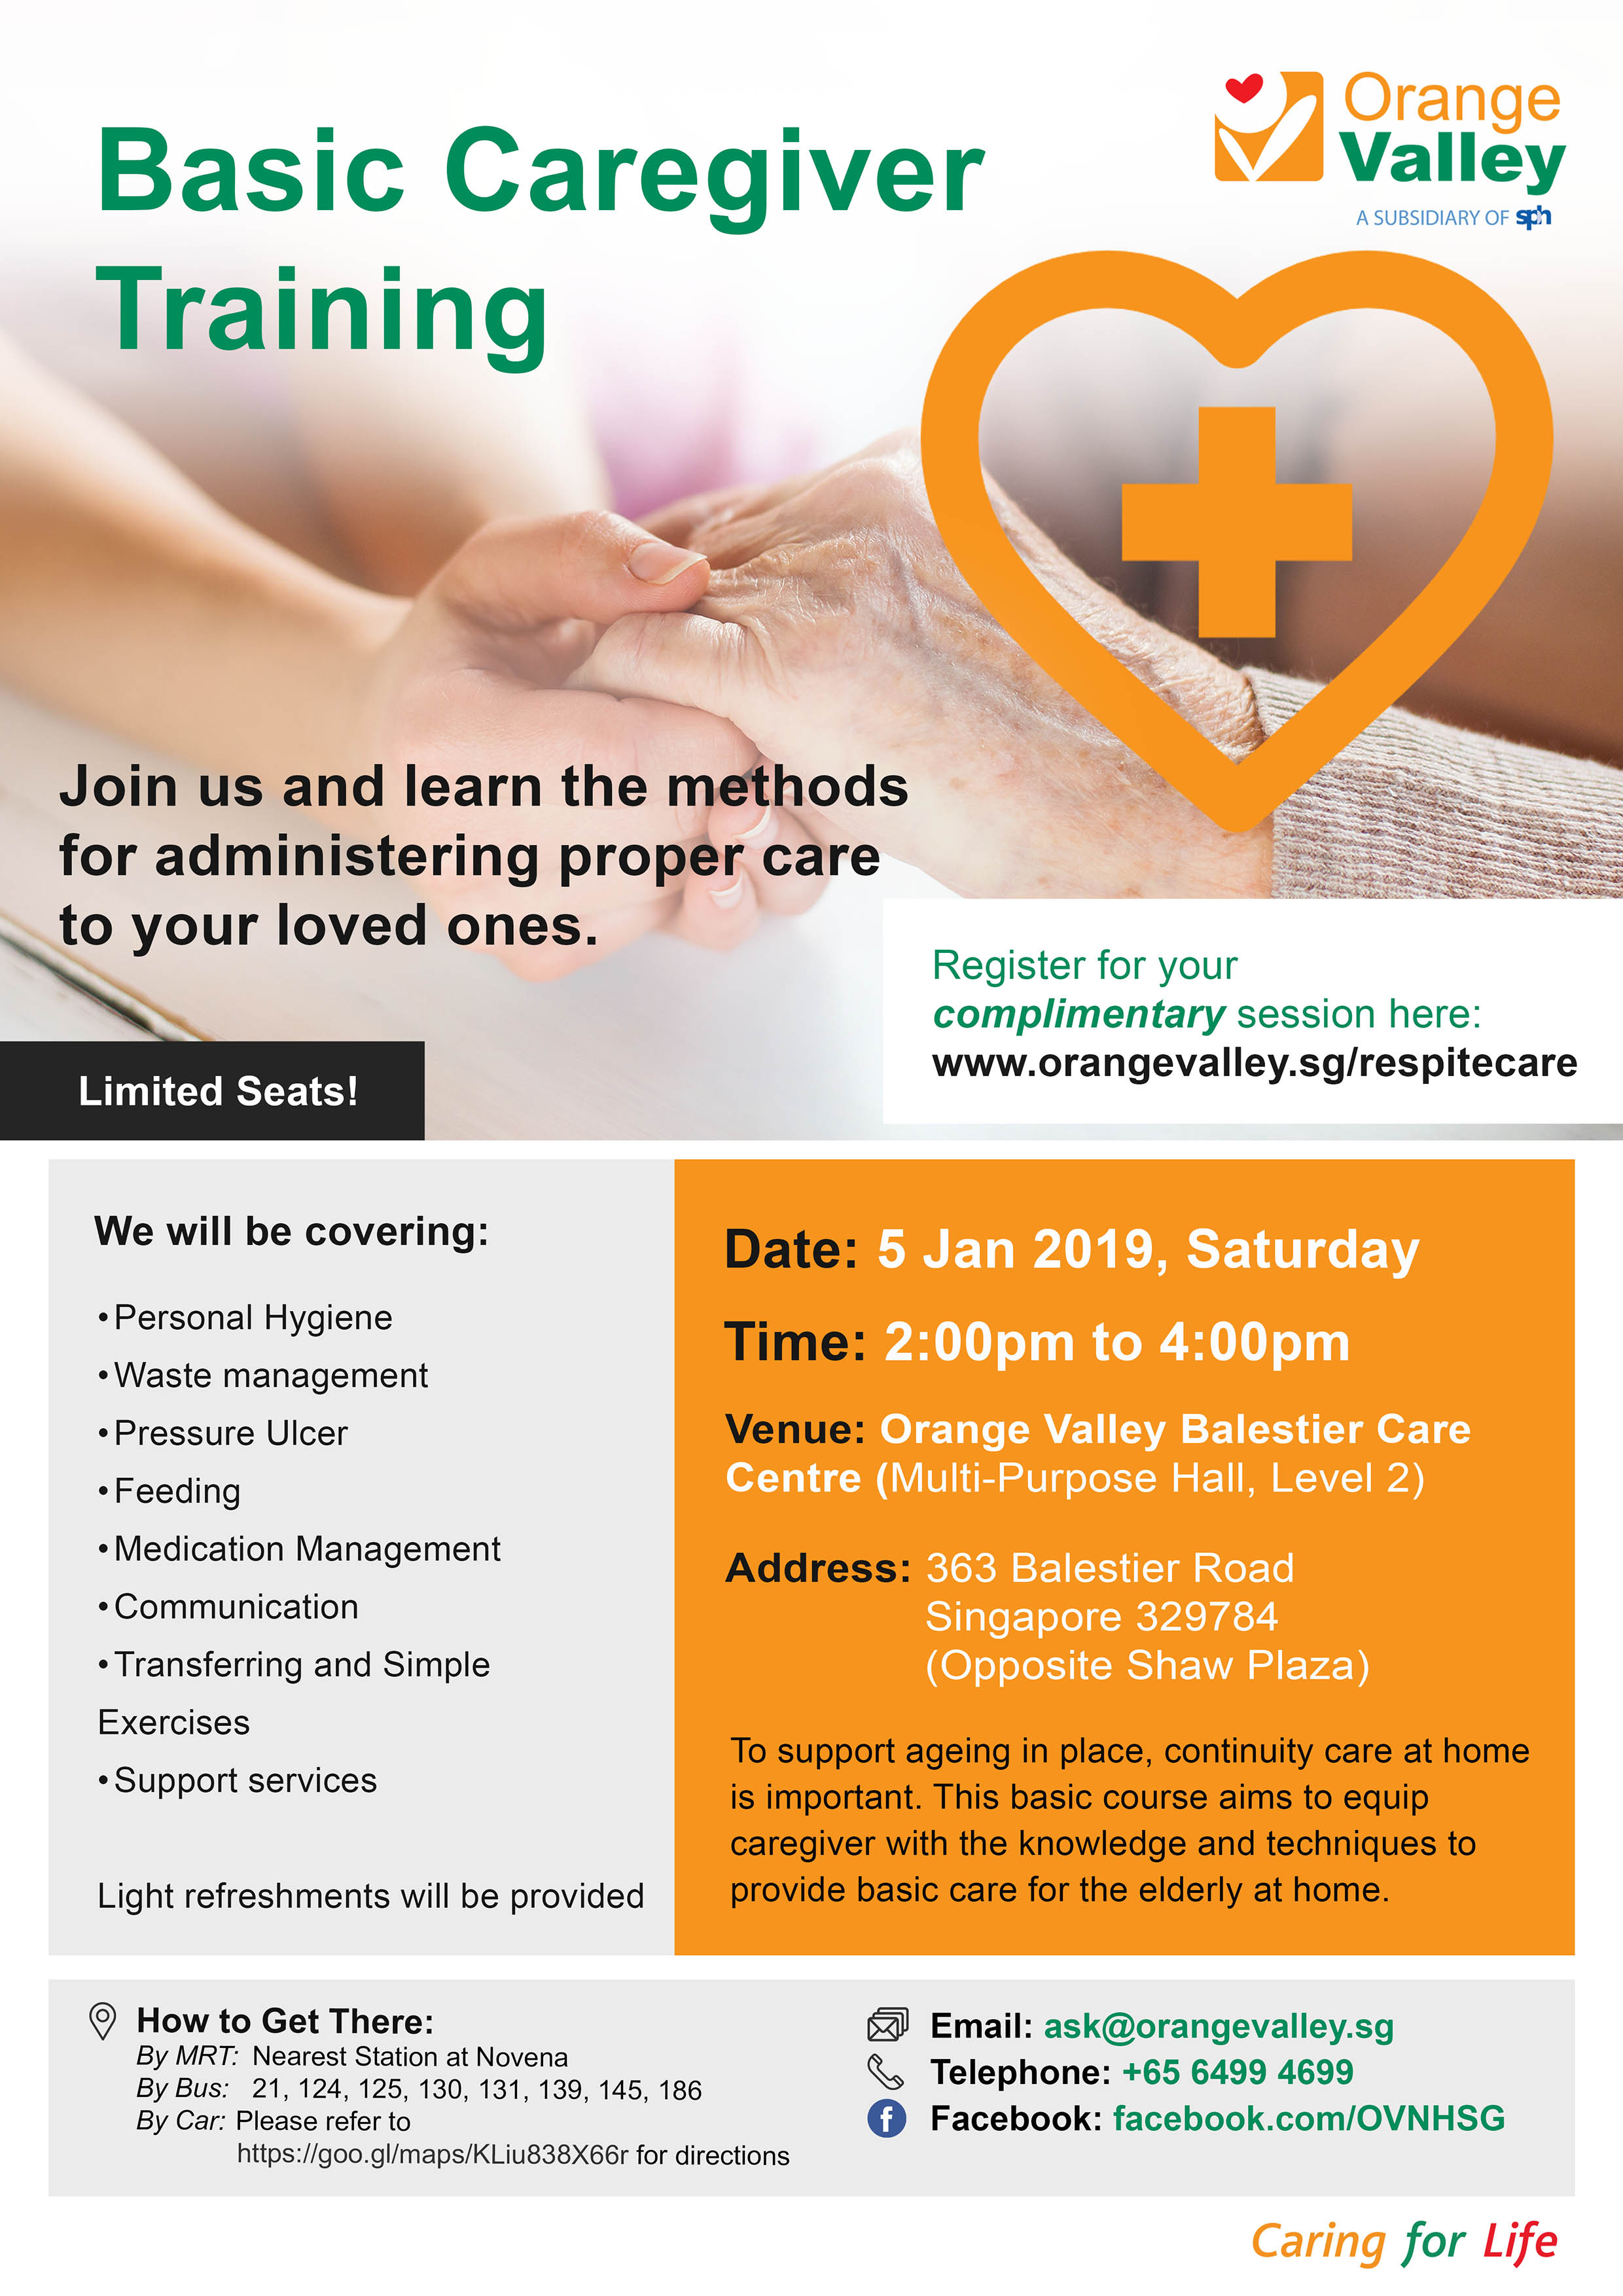 Orange Valley Basic Caregiver Training Poster